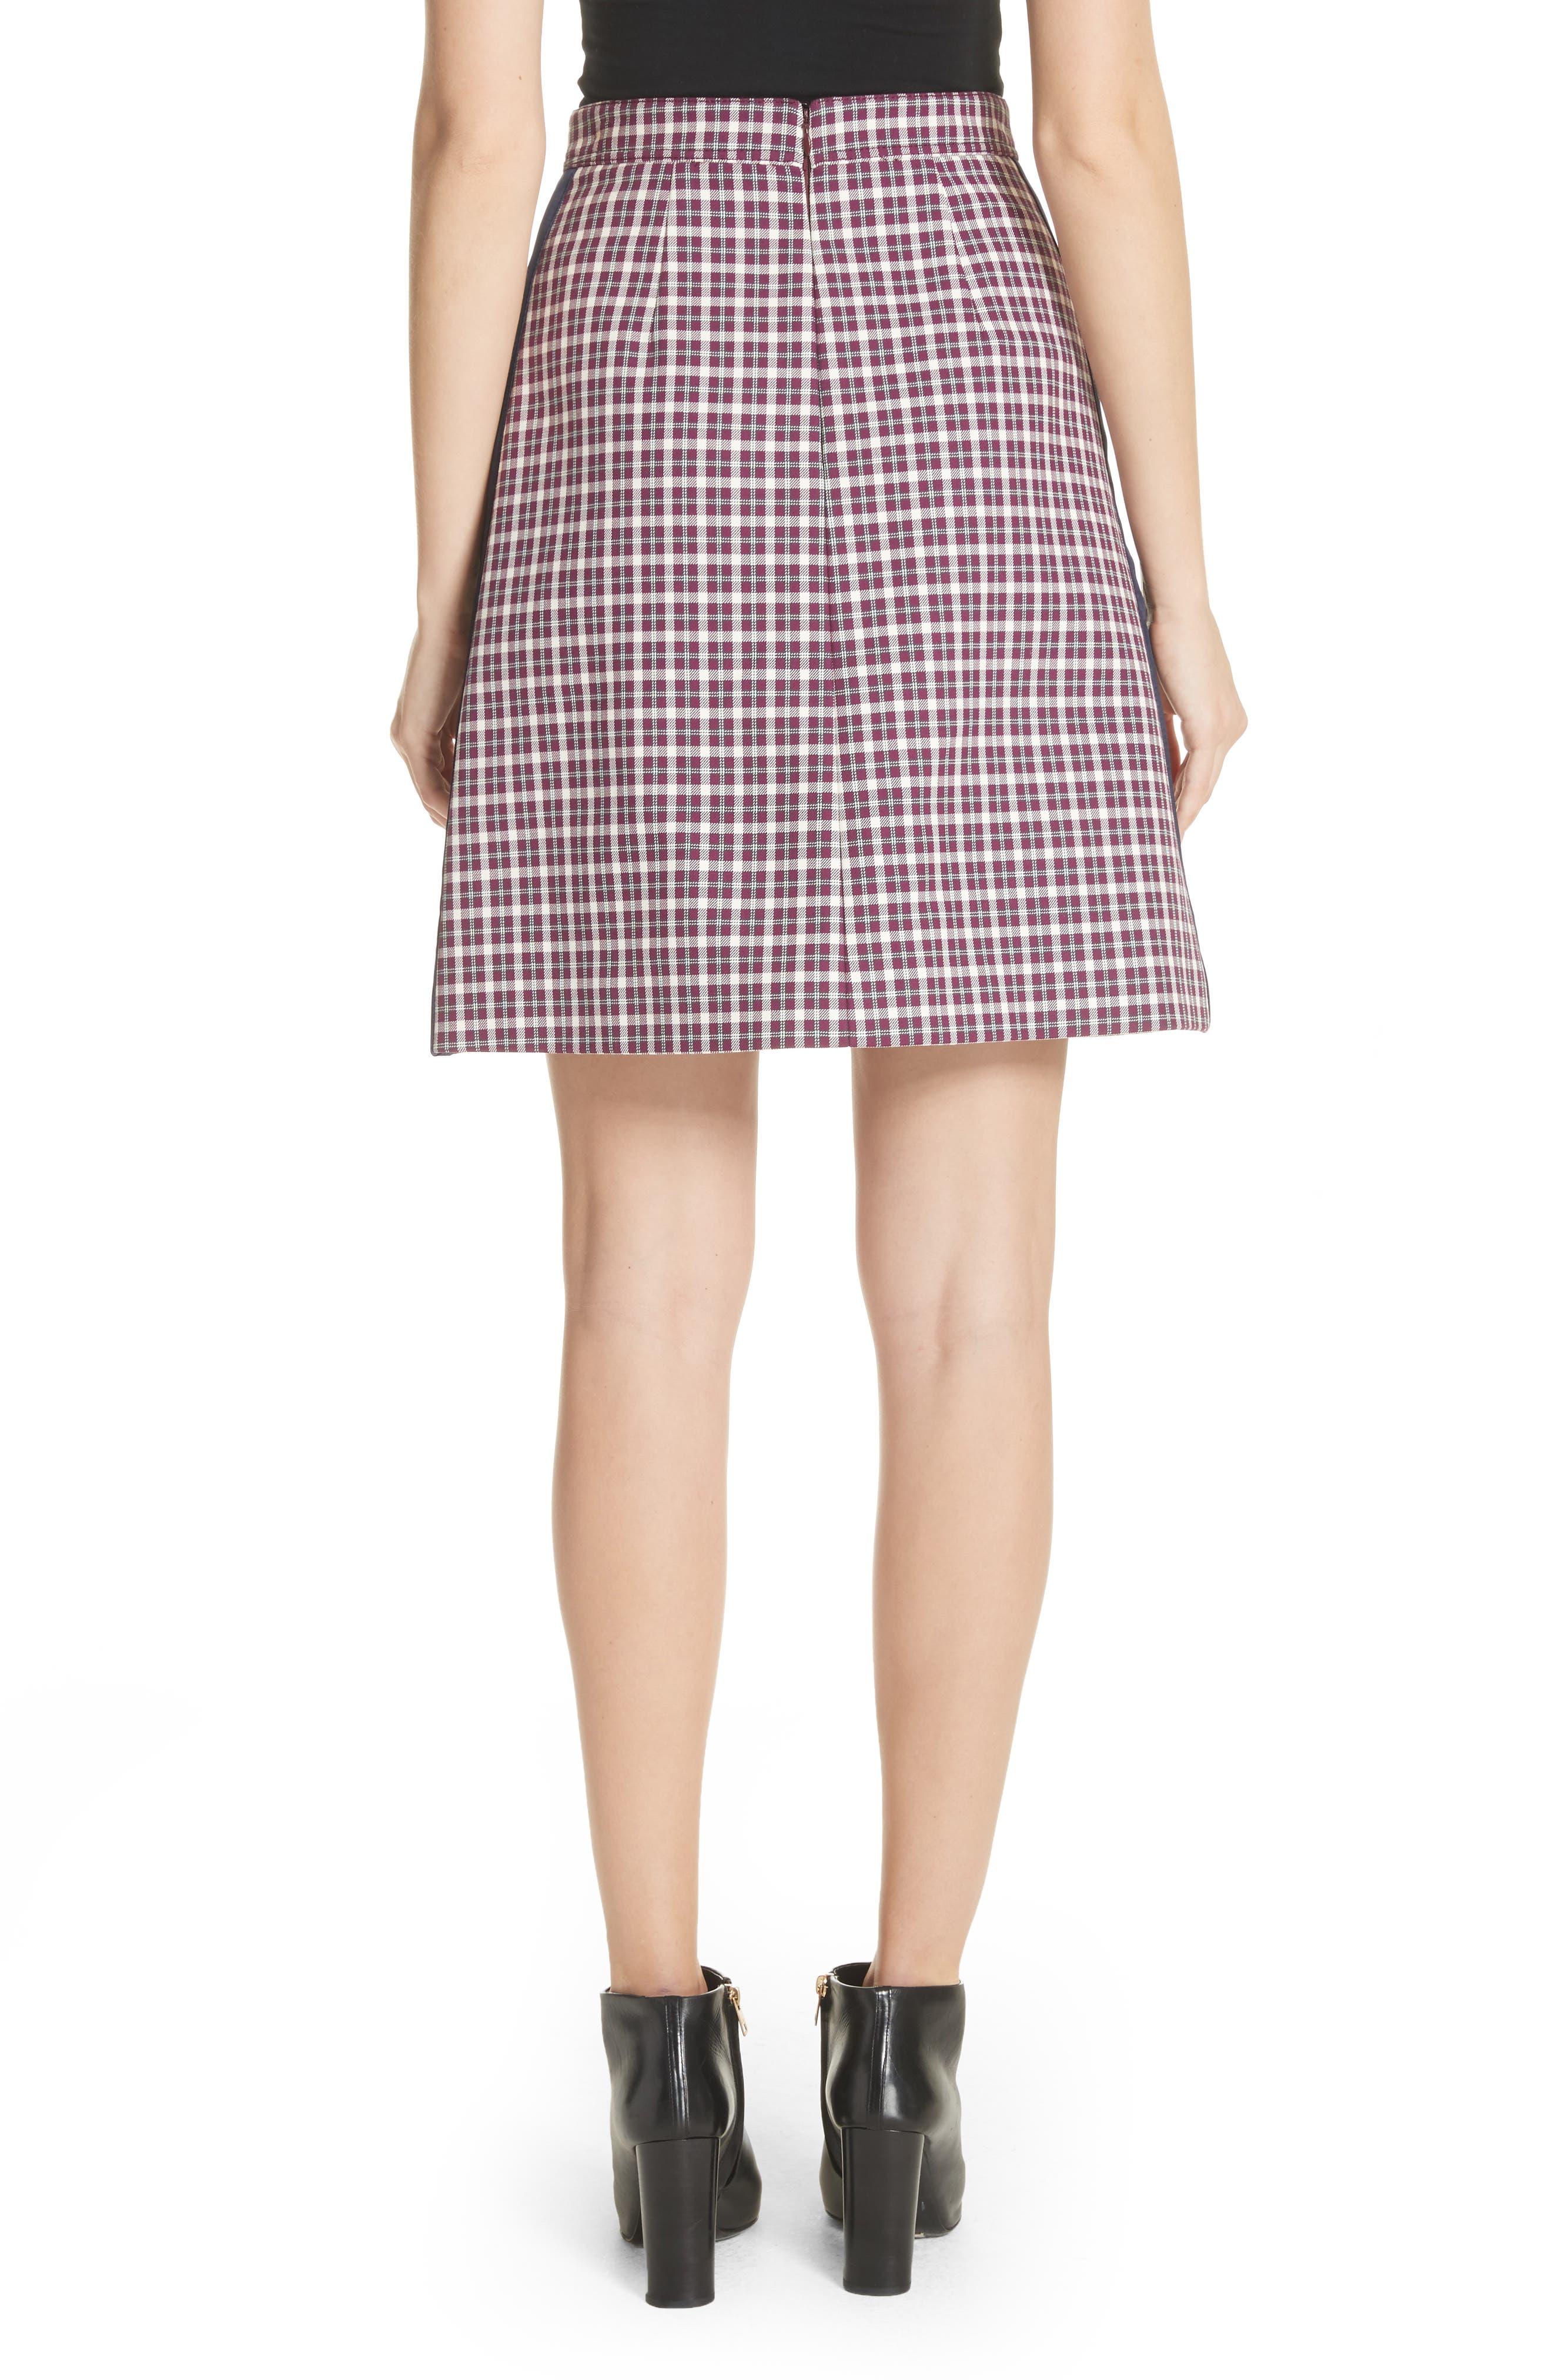 Stanforth Plaid A-Line Skirt,                             Alternate thumbnail 2, color,                             BURGUNDY